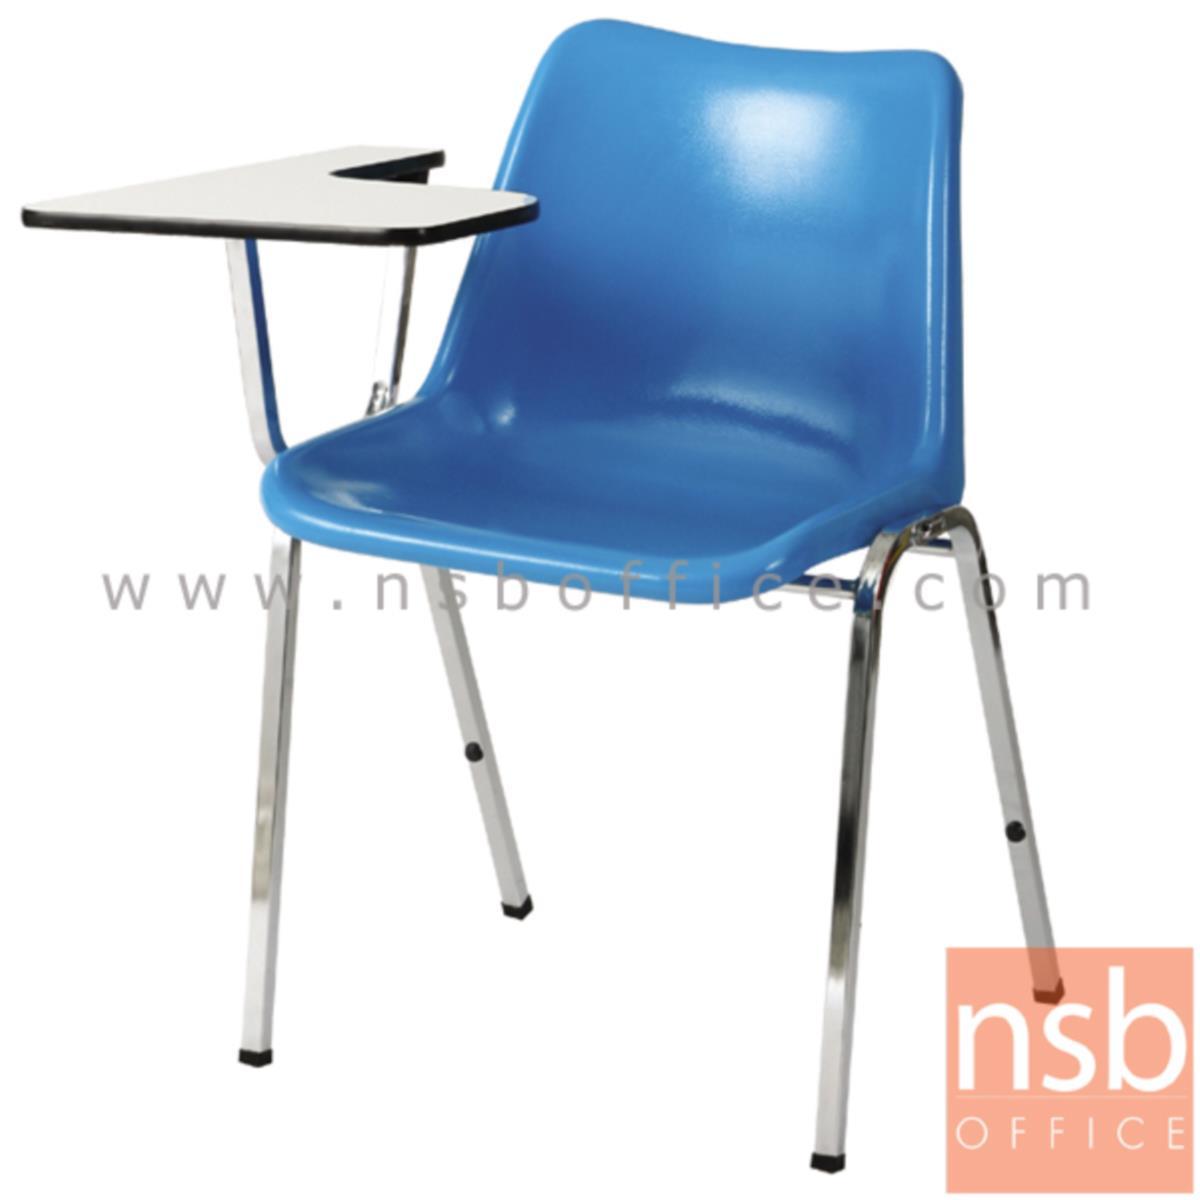 B07A030:เก้าอี้เลคเชอร์เฟรมโพลี่ รุ่น TY-PC20CL ขาเหล็กชุบโครเมี่ยม